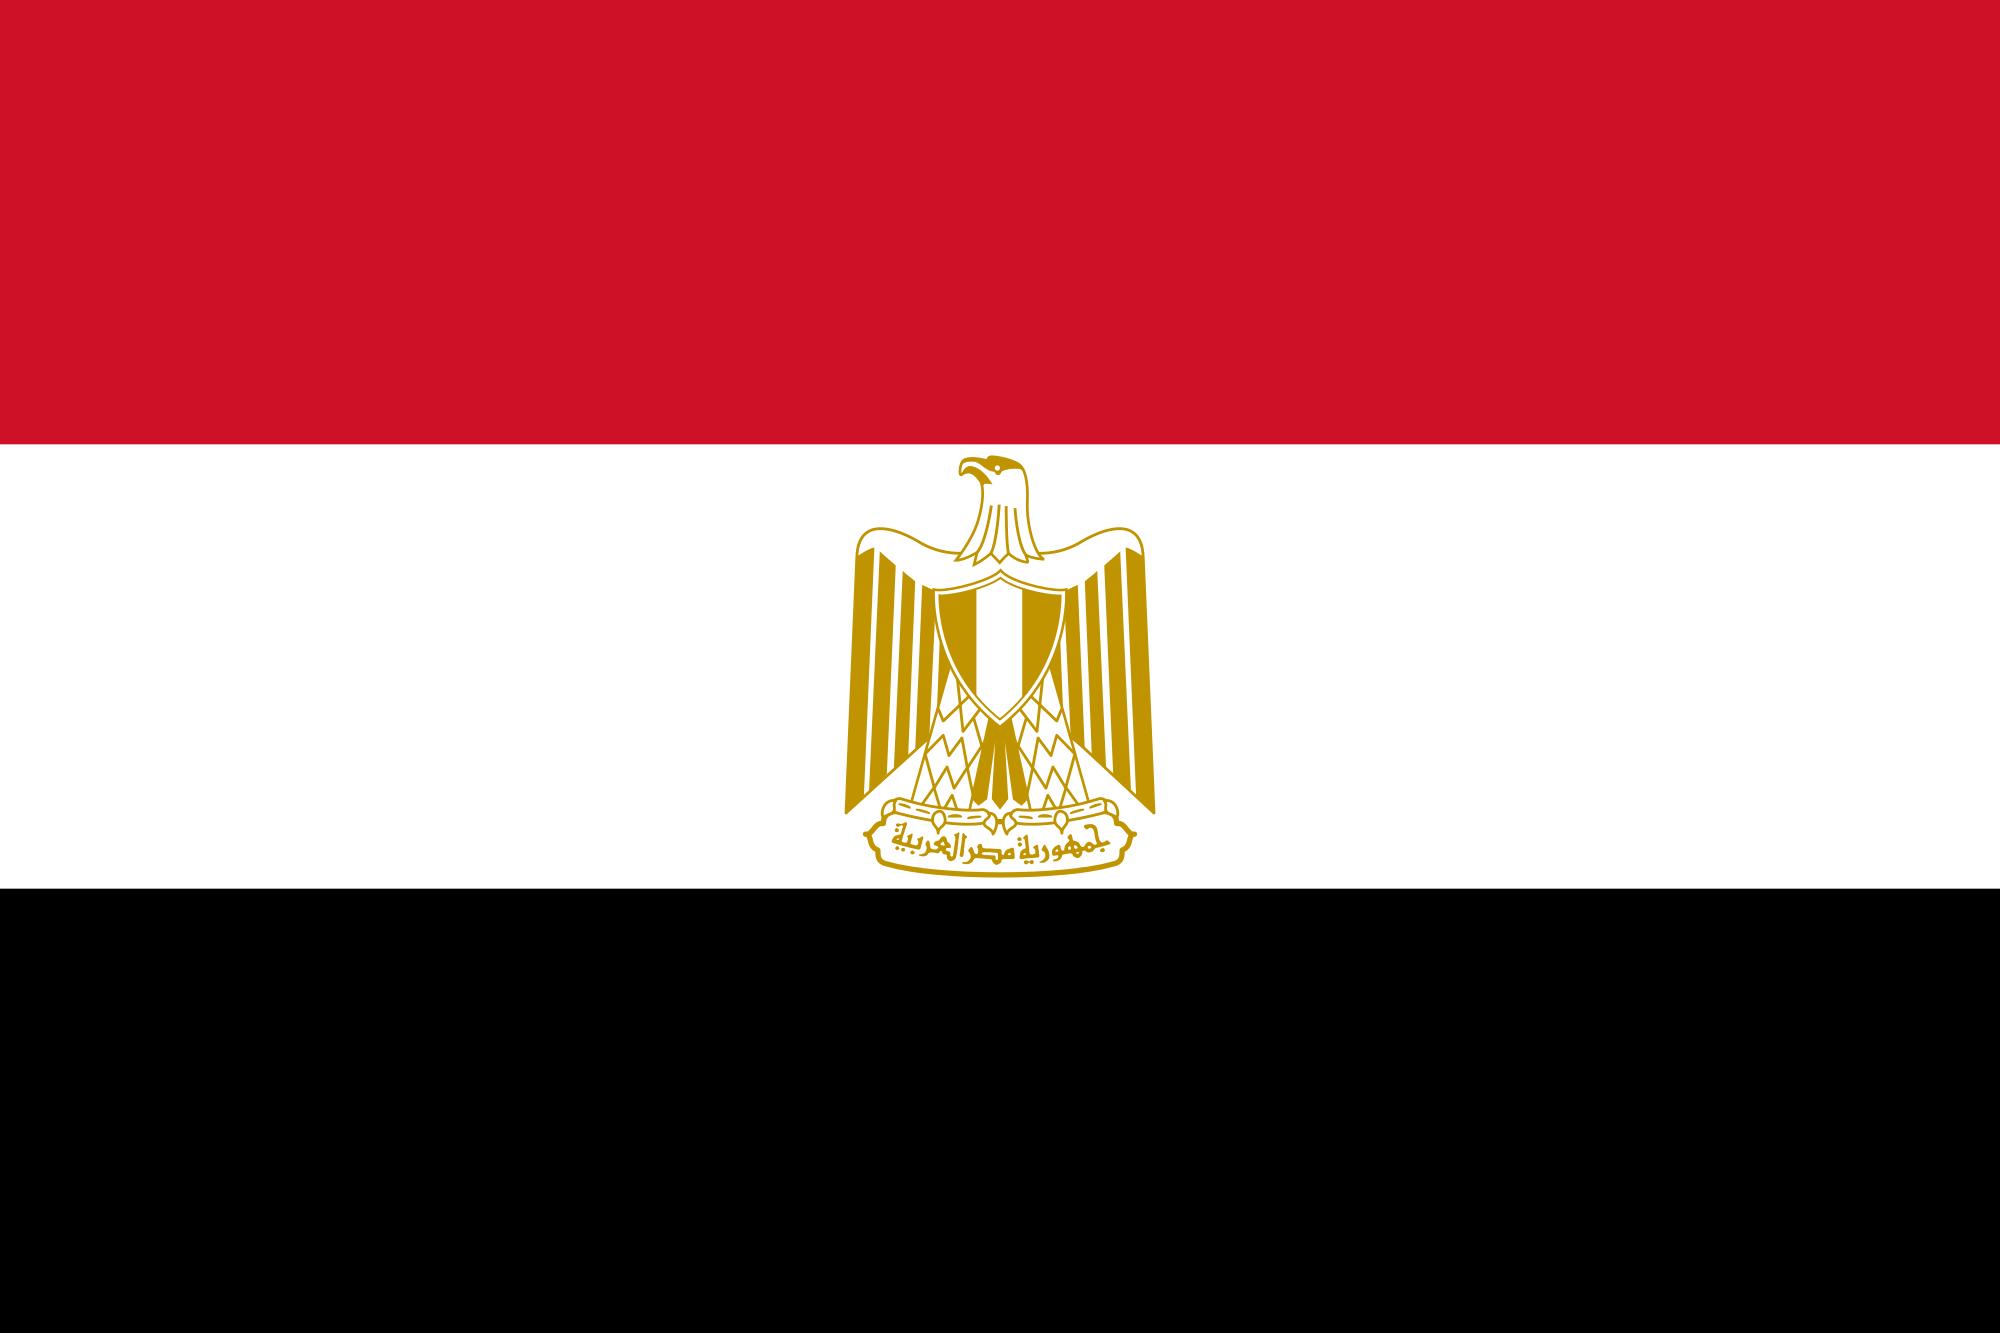 Nasser Military Academy Emblem